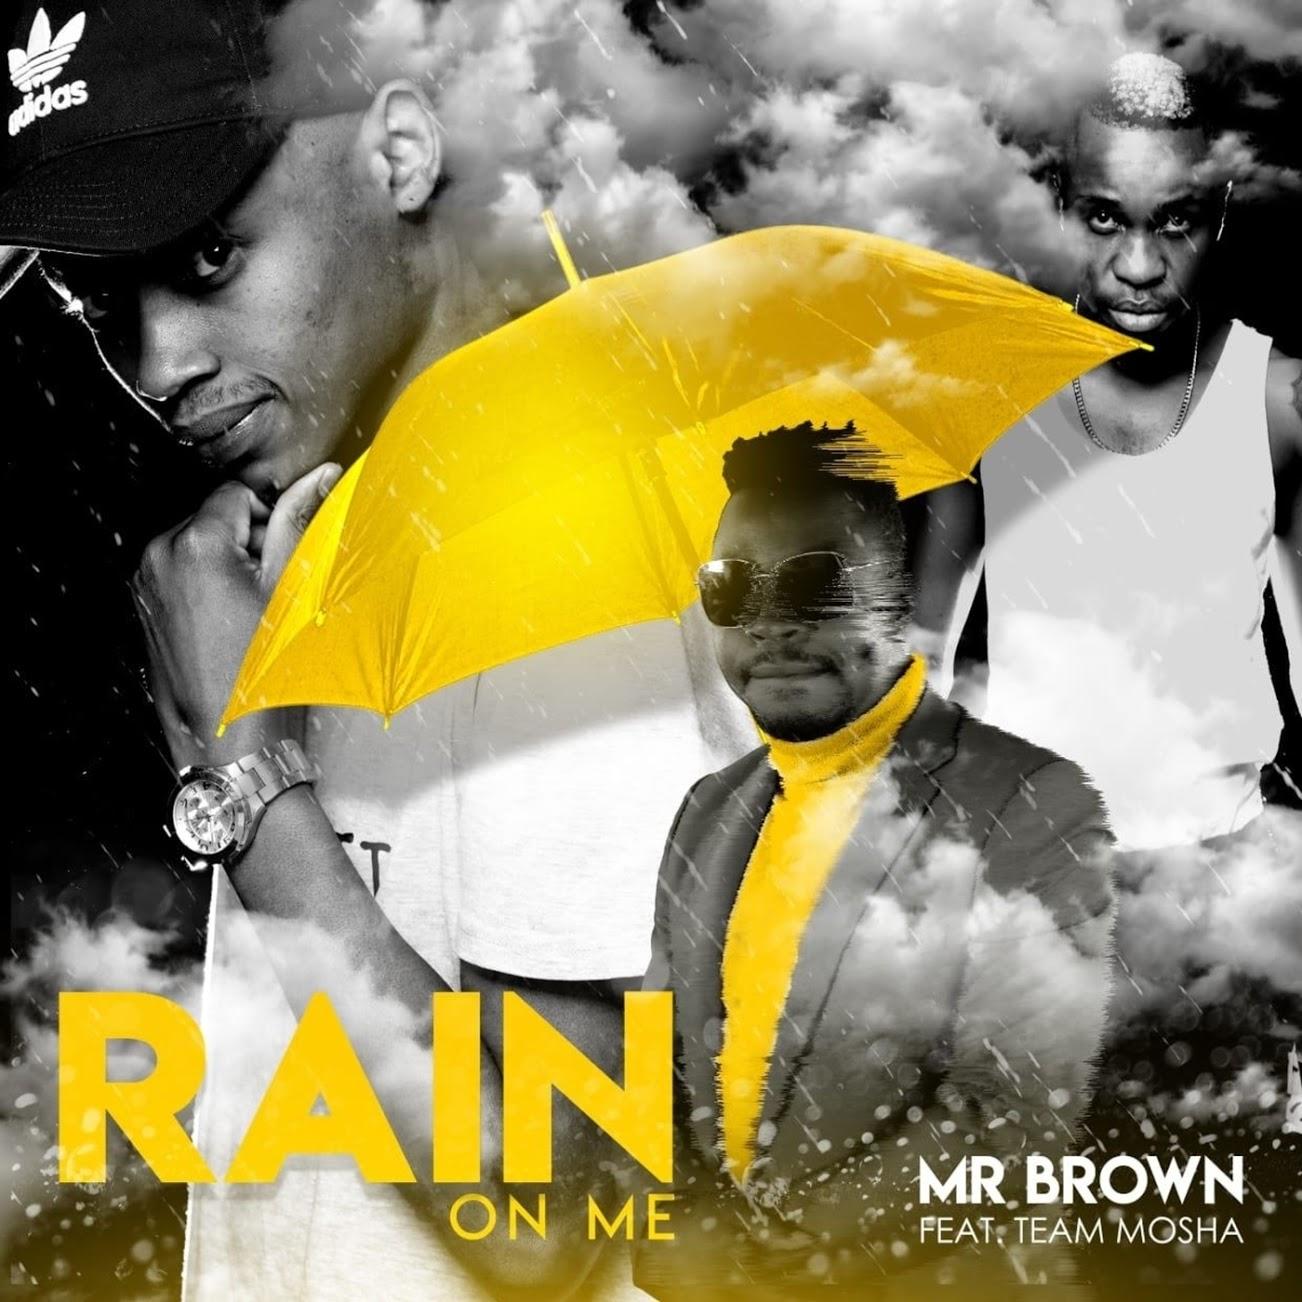 rain on me - photo #26